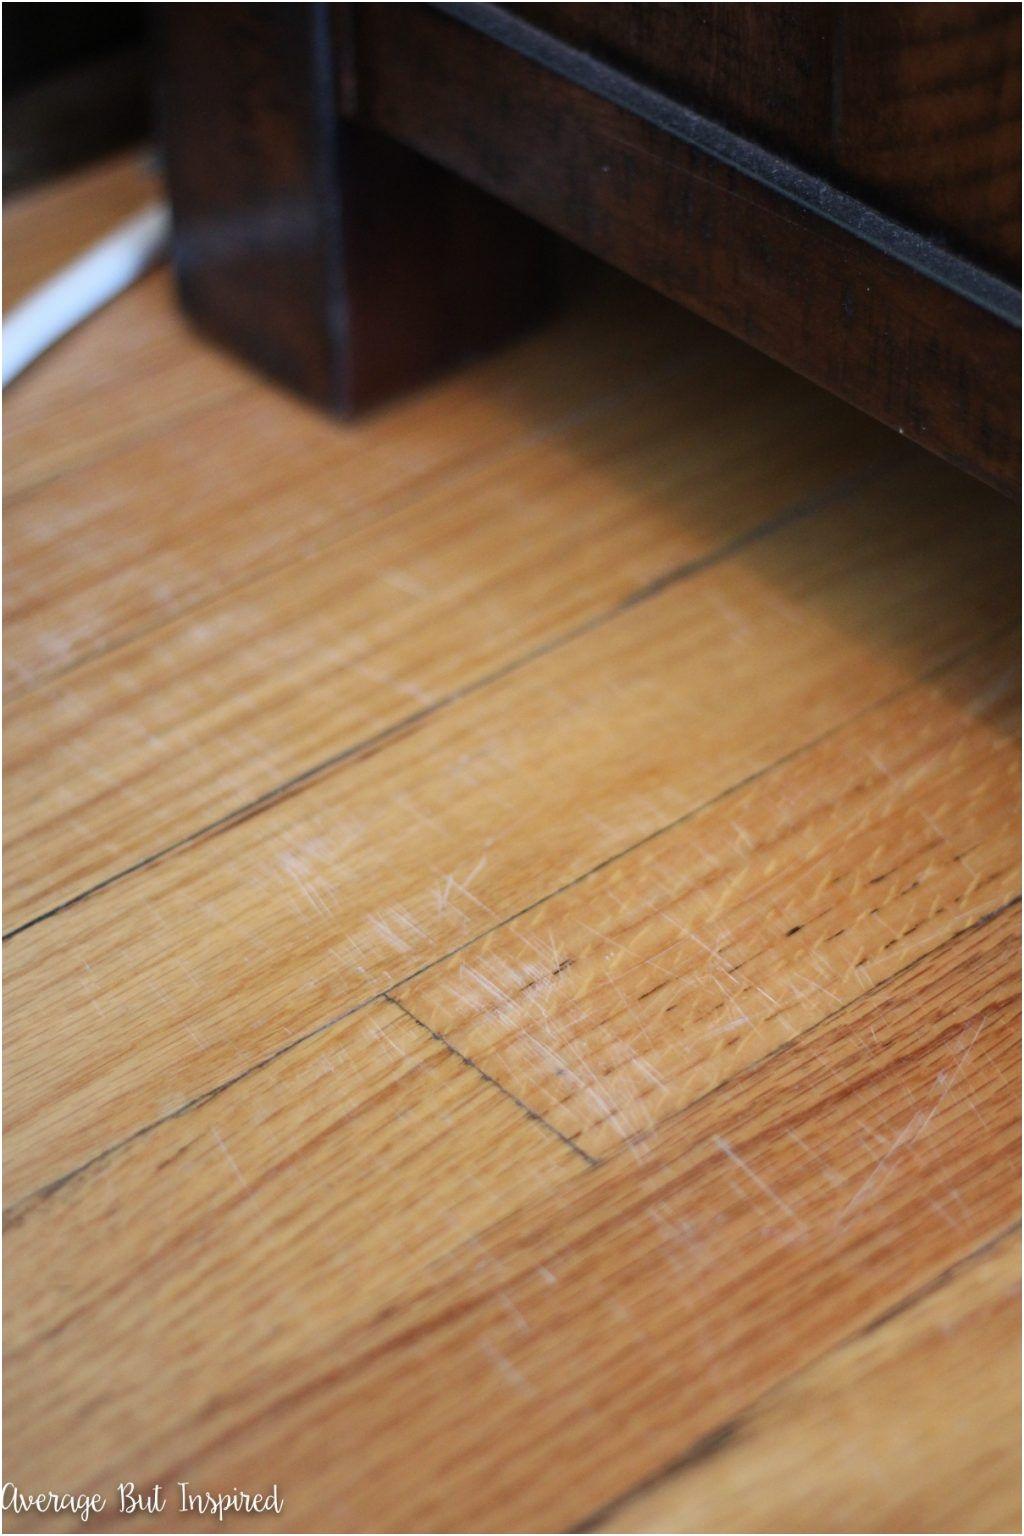 hardwood flooring newark nj of how to repair scratches on laminate flooring flooring design pertaining to how to fix scratched hardwood floors in no time